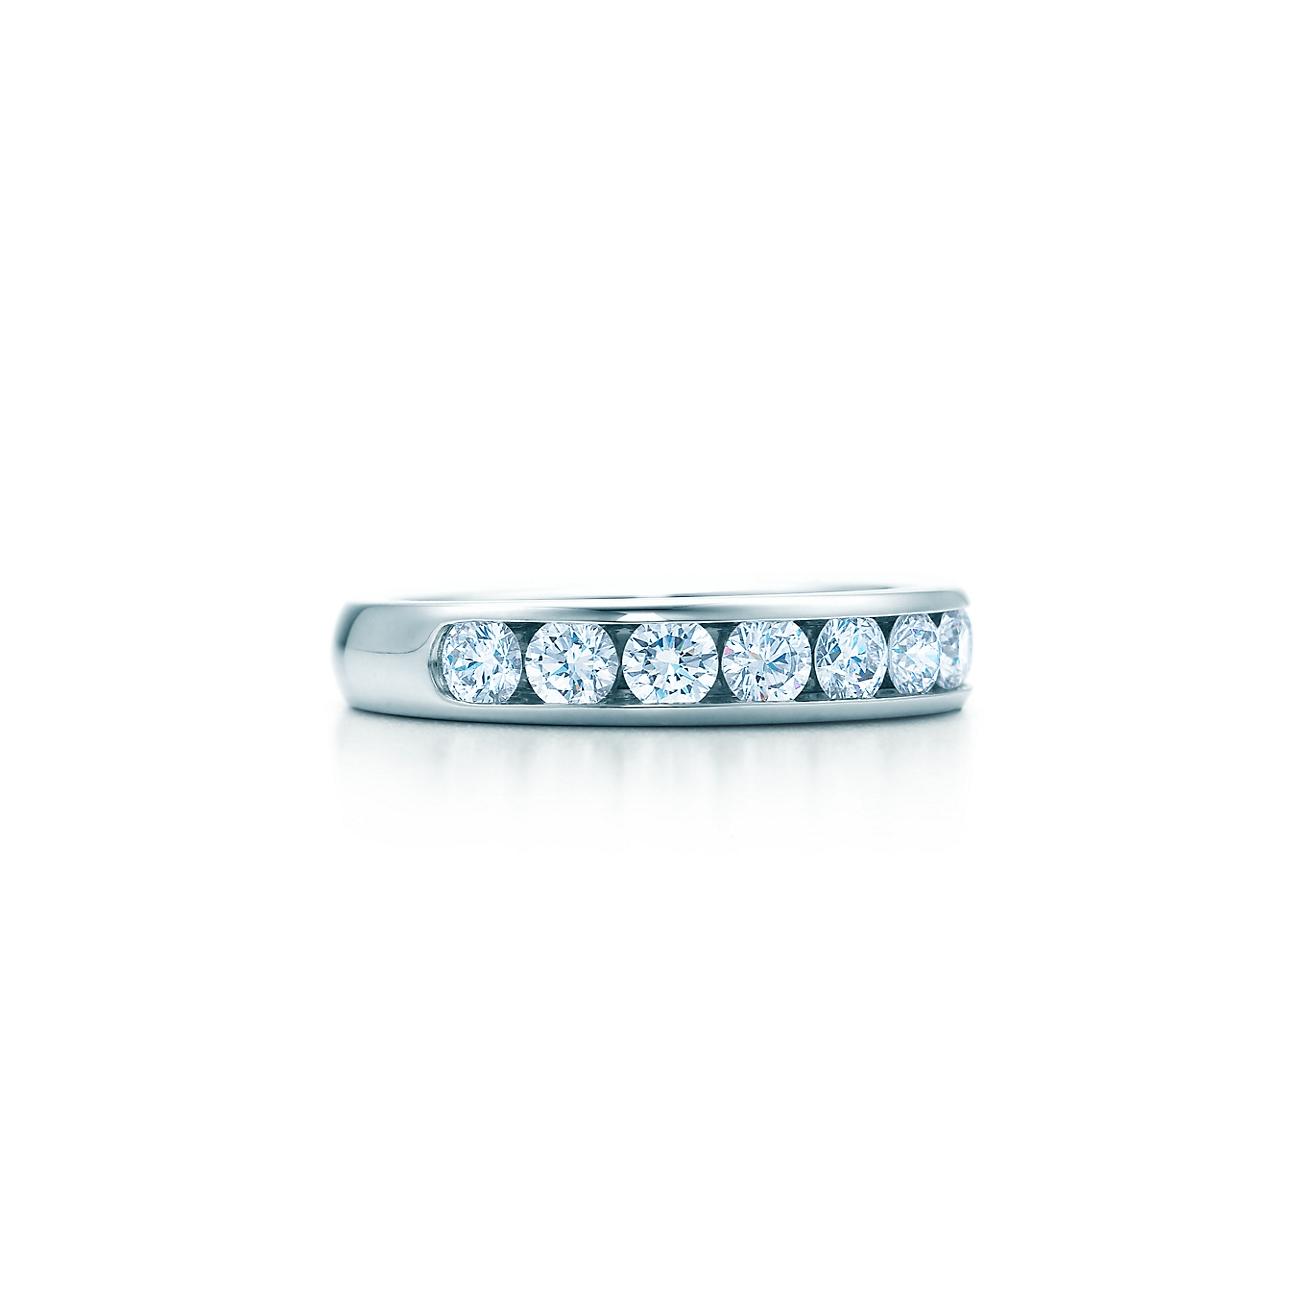 Tiffany diamond wedding band in platinum 39 mm wide tiffany deletelarge tiffany diamond wedding band junglespirit Images